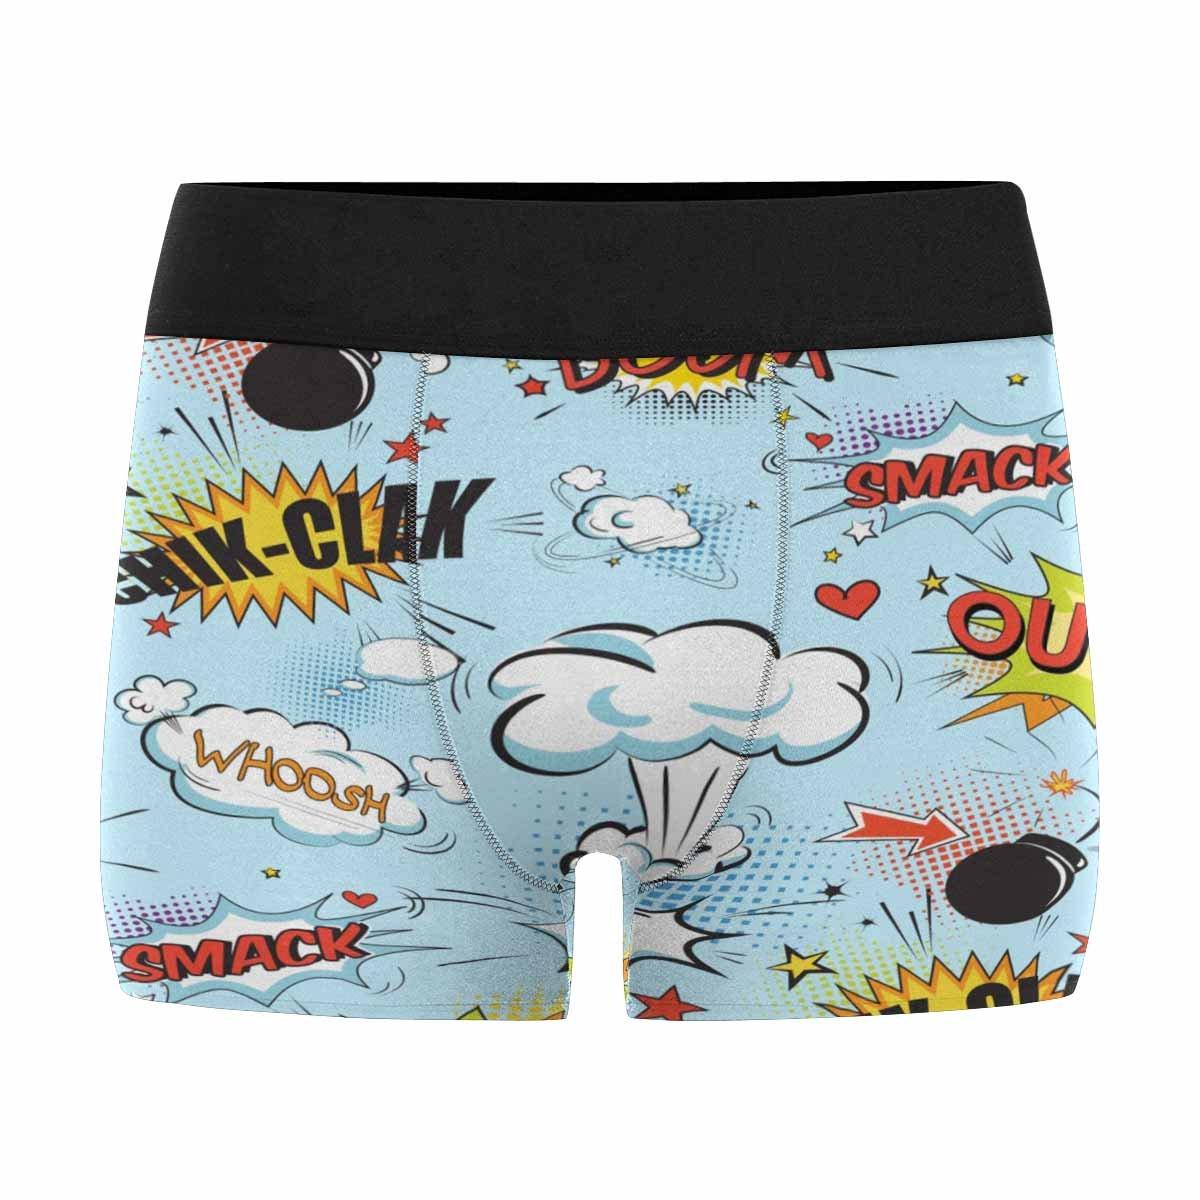 INTERESTPRINT Mens Boxer Briefs Underwear Comic Speech Bubbles in Pop Art Style with Bomb Cartoon XS-3XL